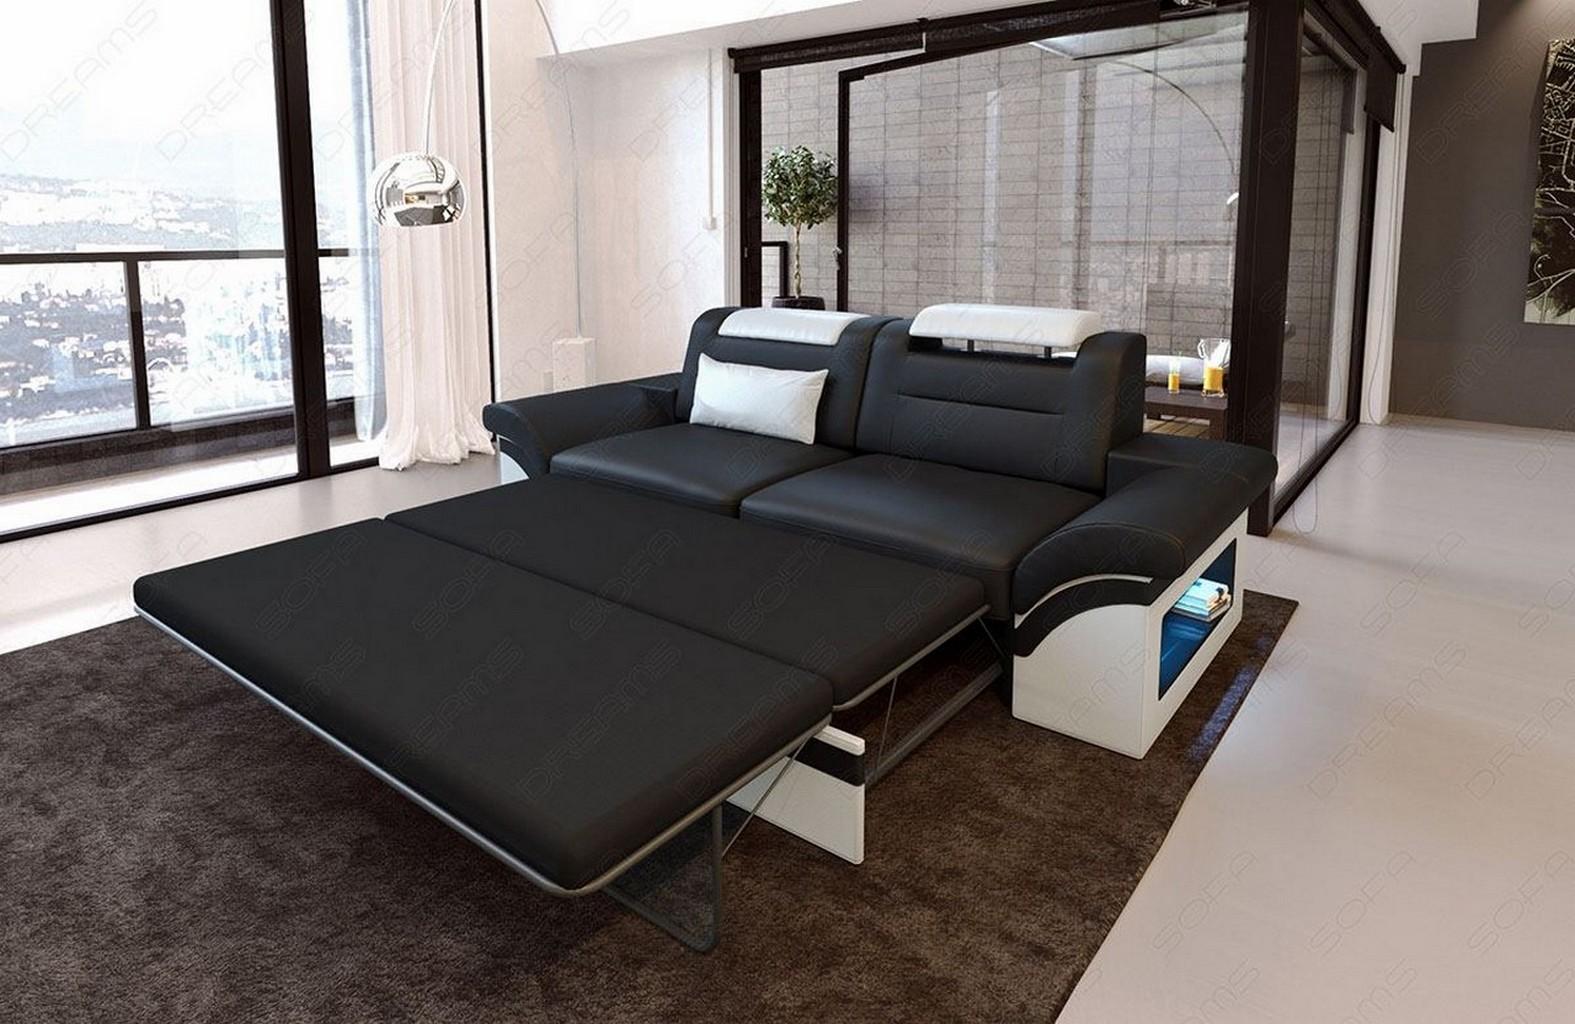 2 Sitzer Sofa Leder Zweisitzer MONZA Couch LED Beleuchtung